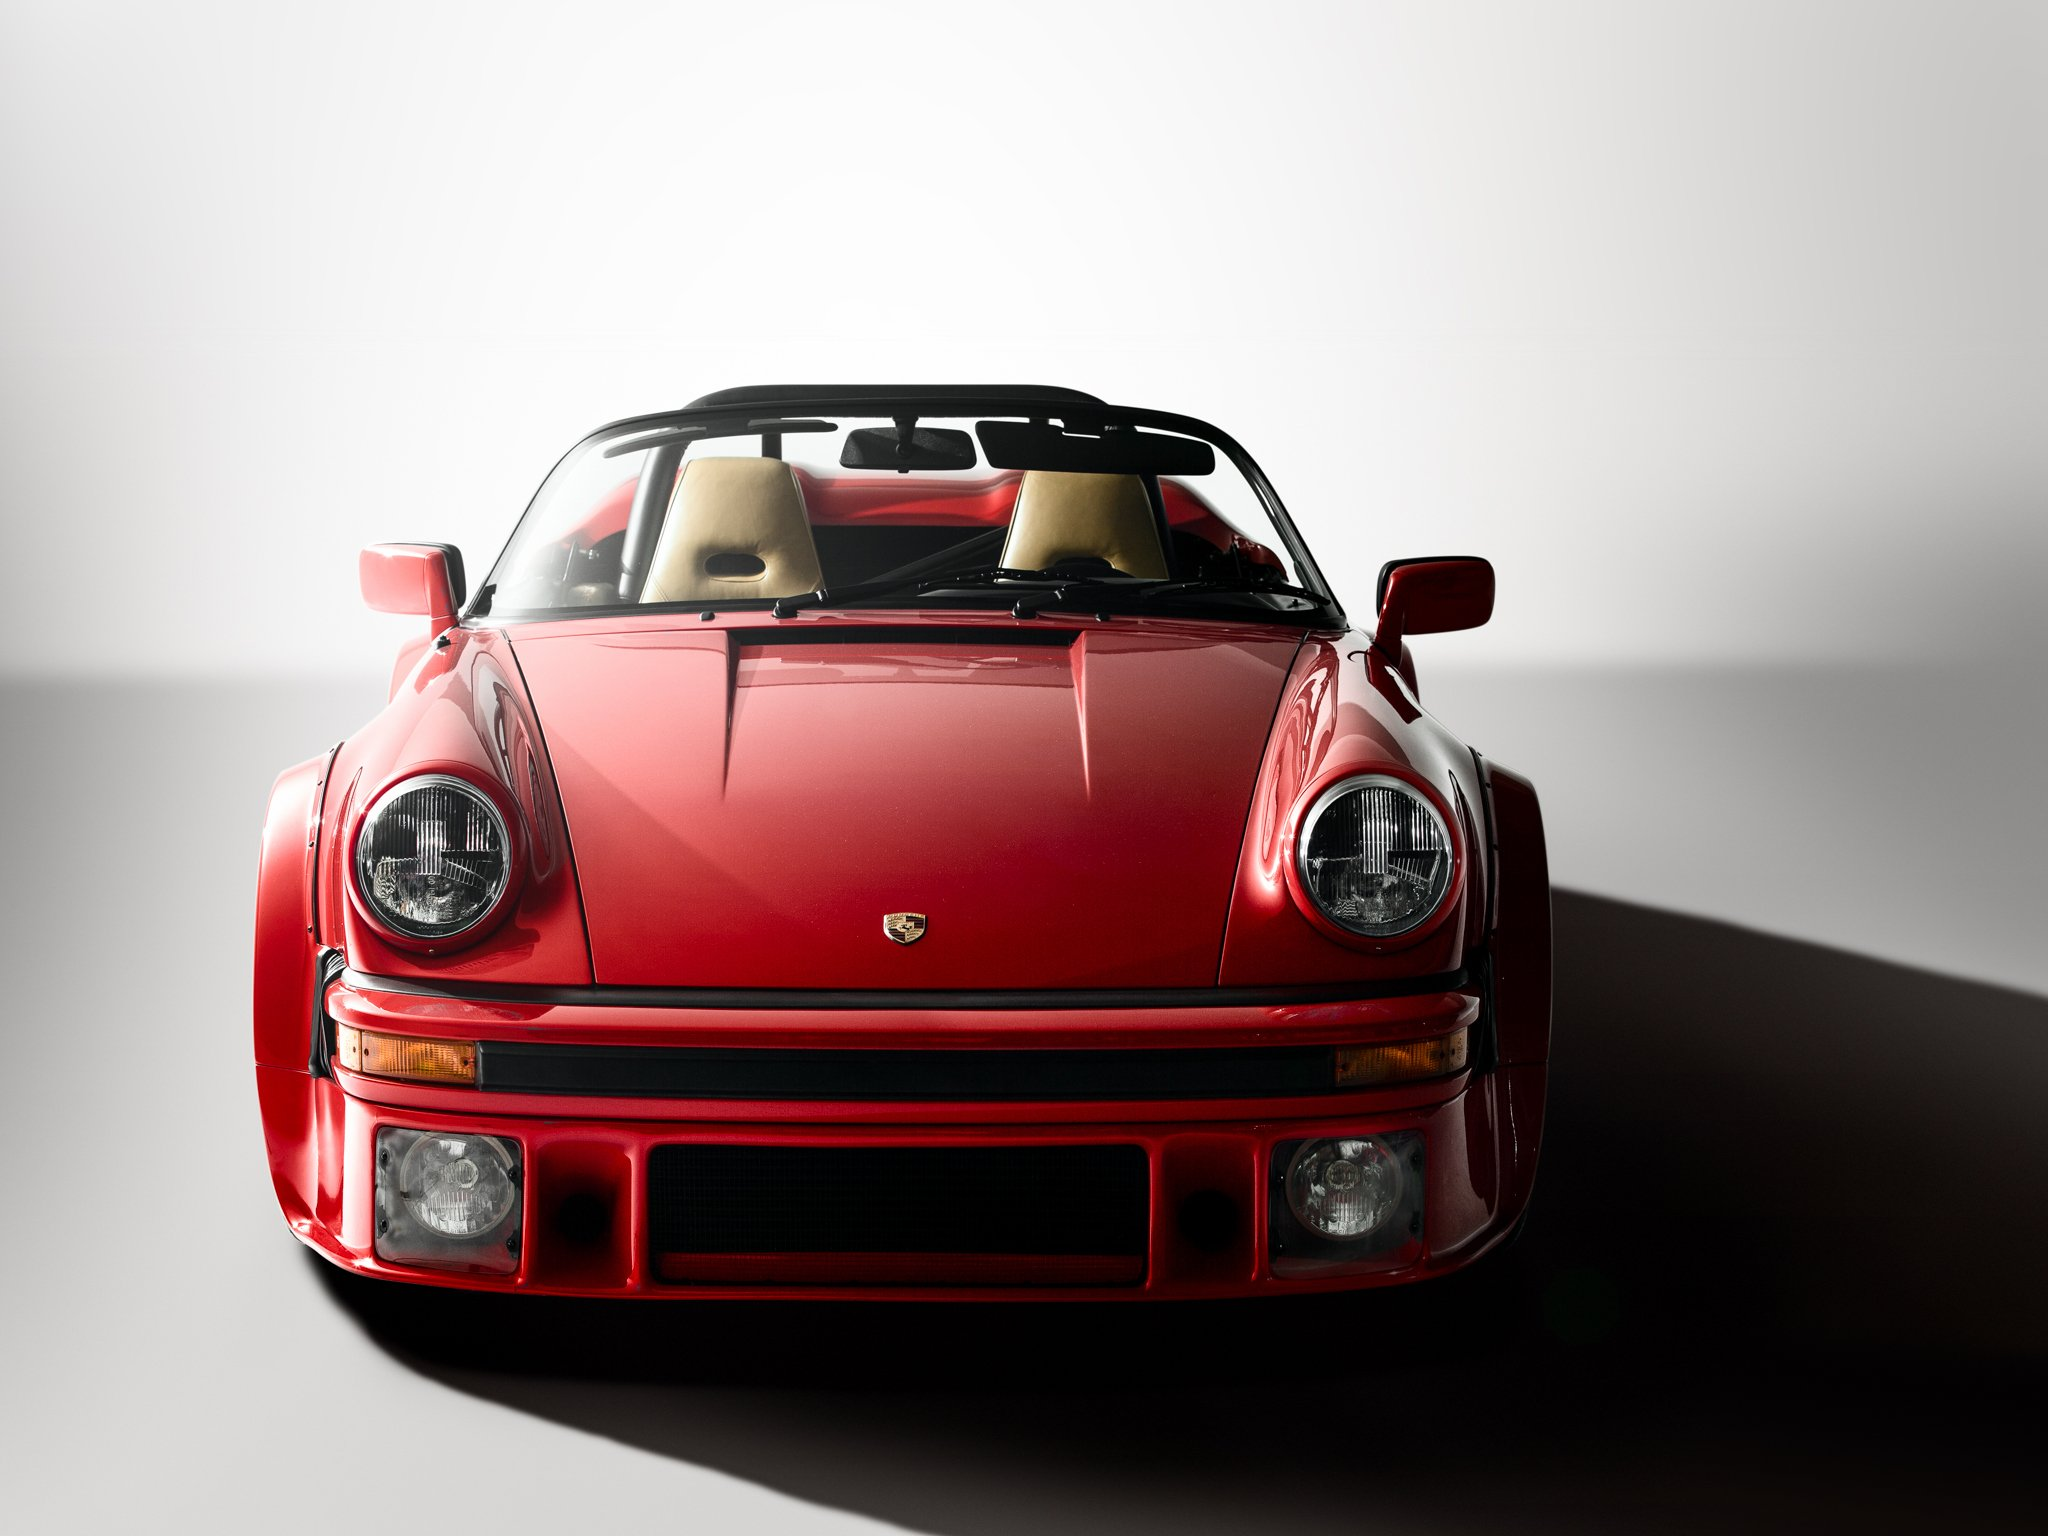 1989 Canepa Porsche 962 Speedster Twin Turbo 964 Tuning